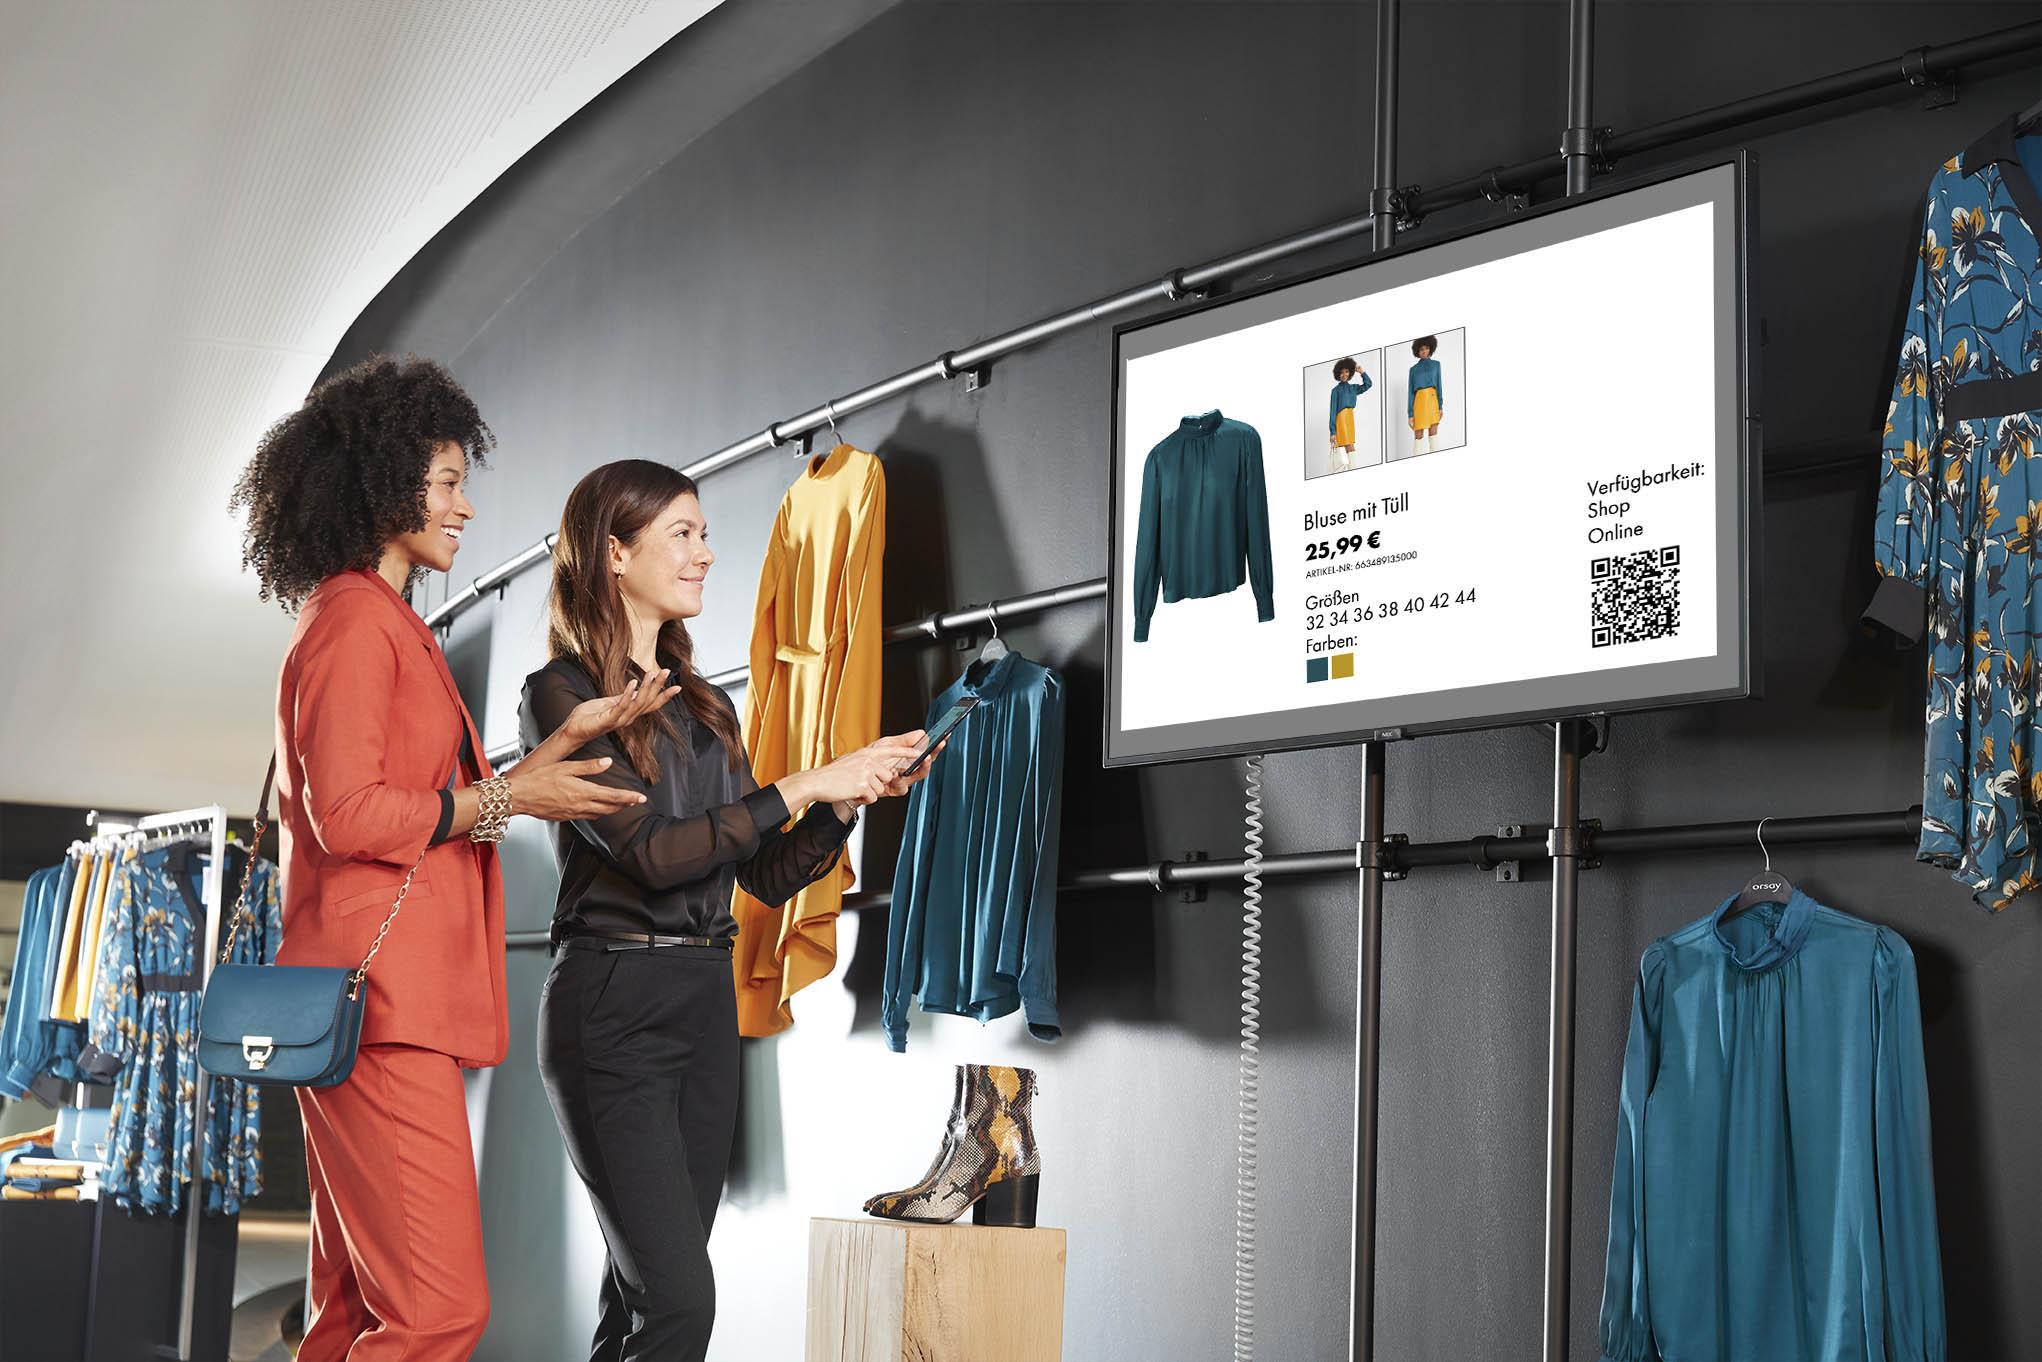 Digital Signage Präsentation und Steuerung via dem InStore Assistant